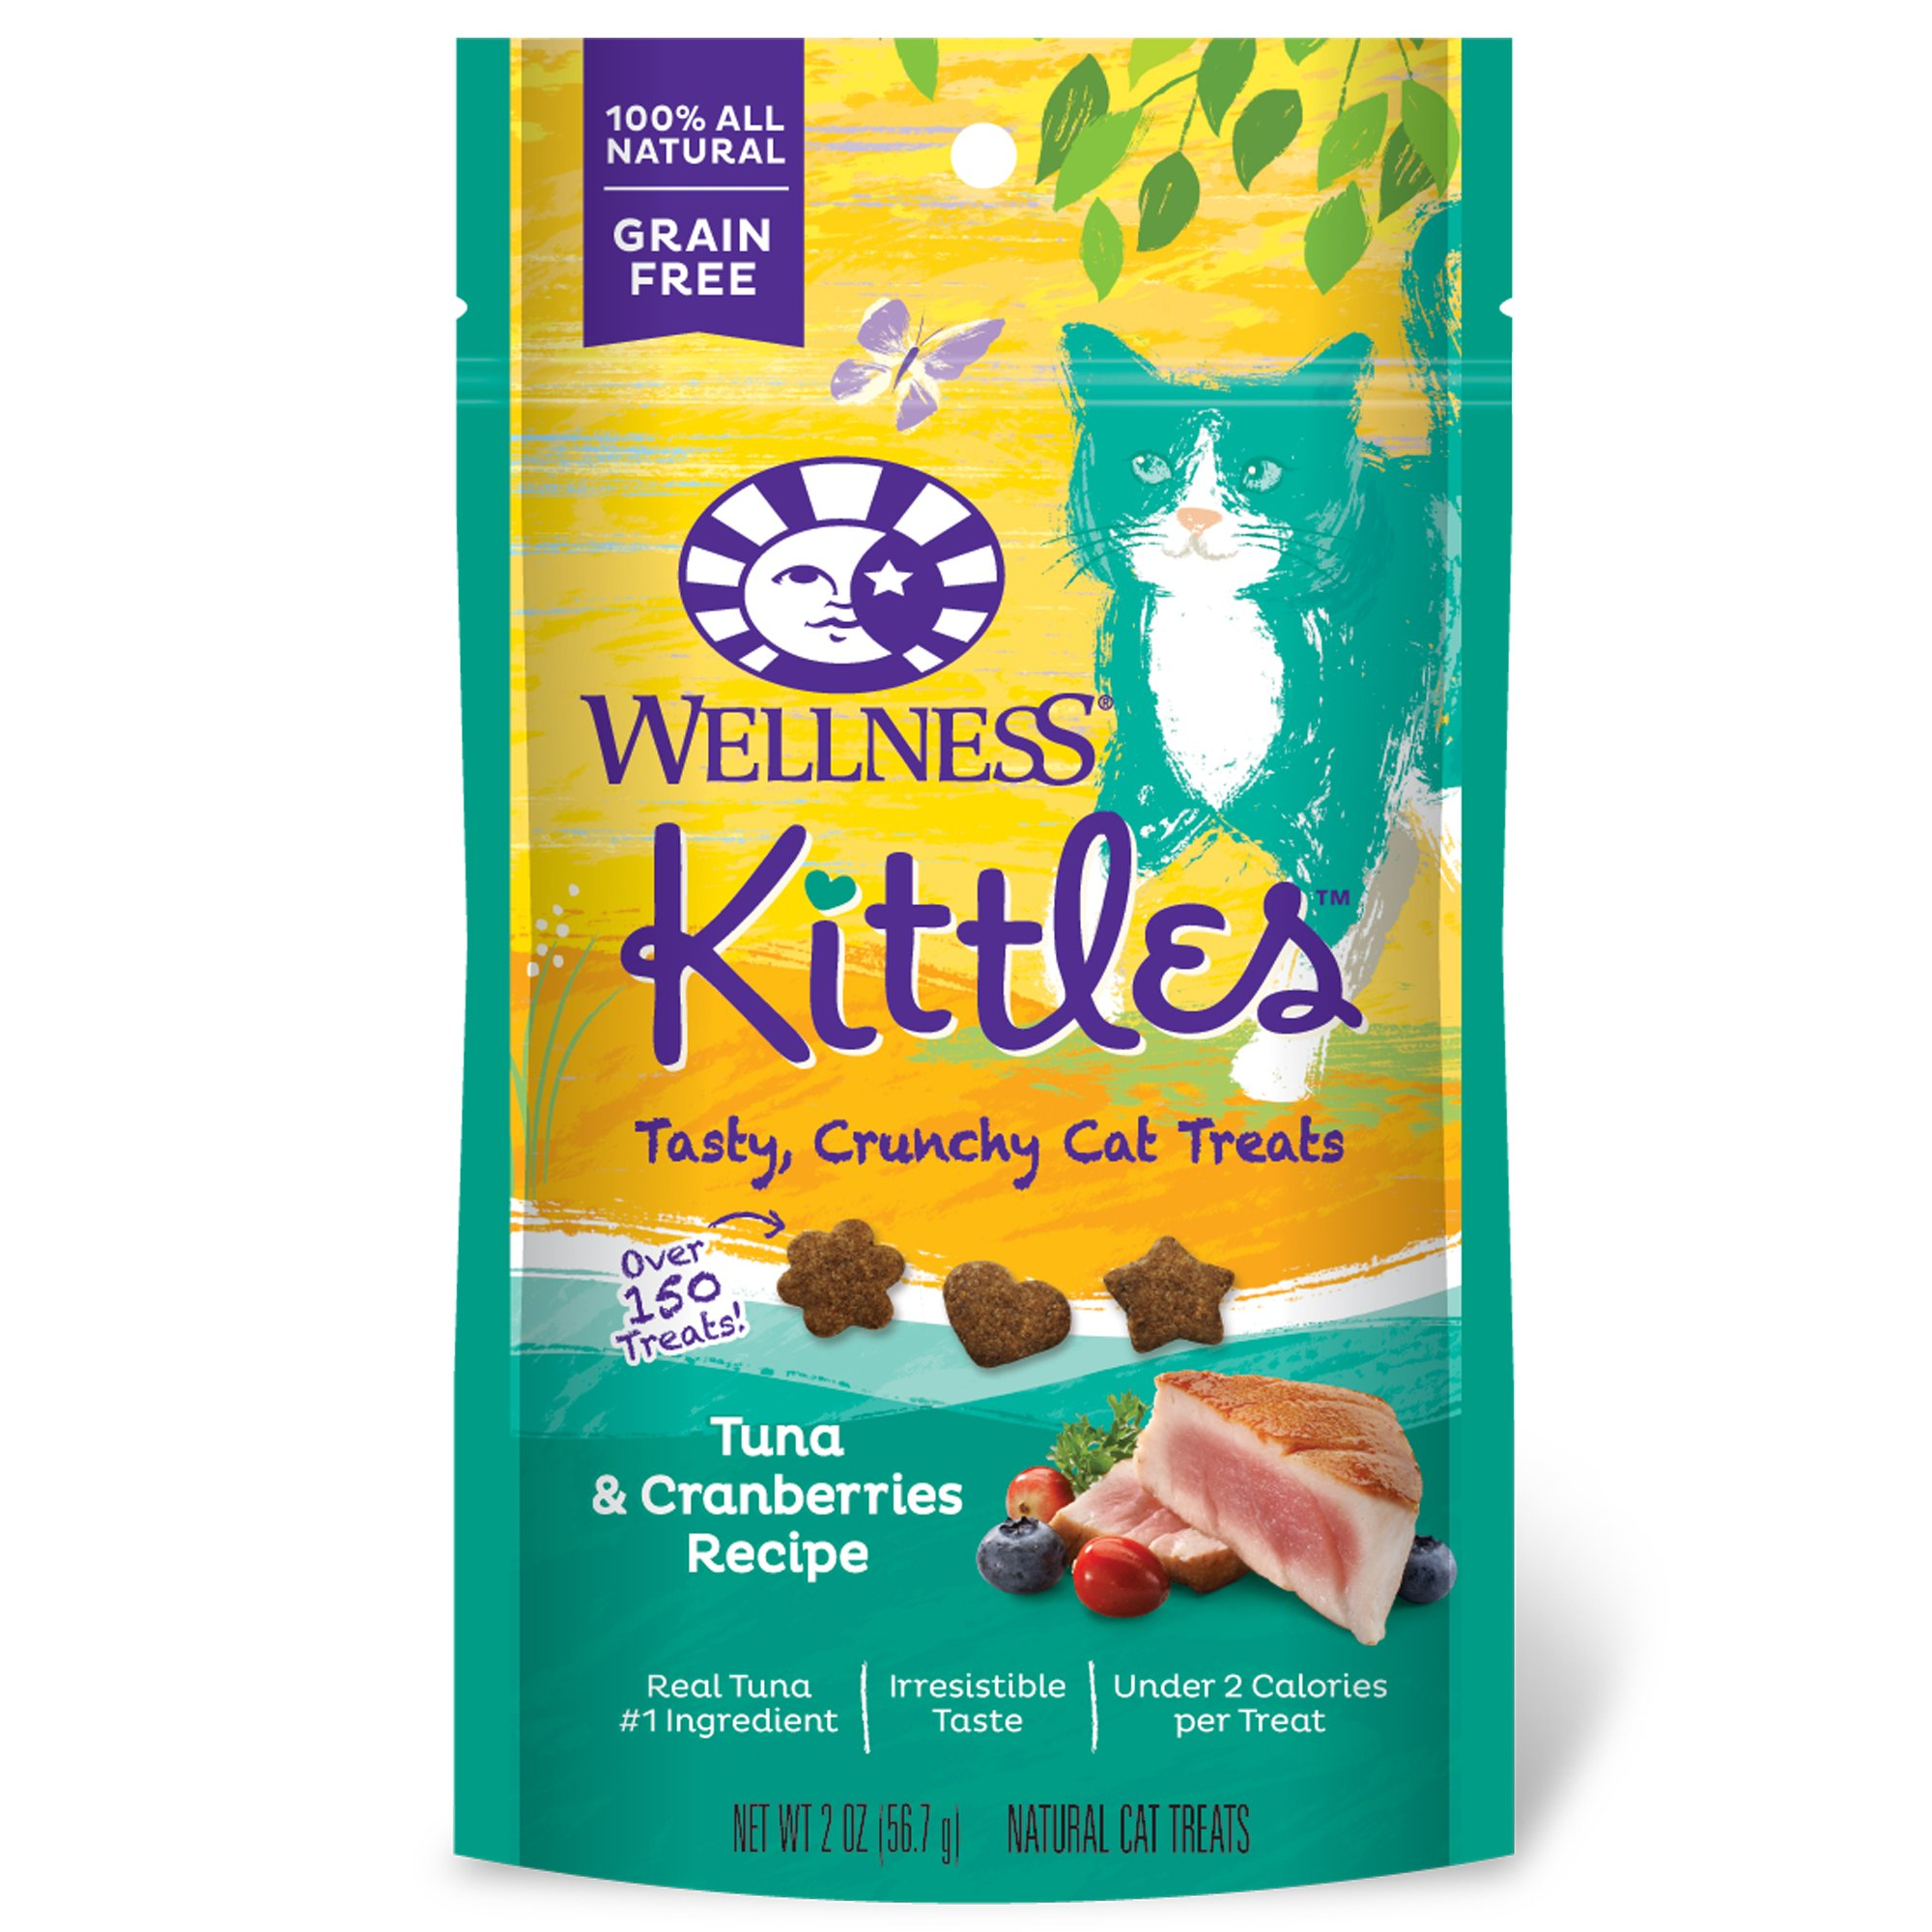 Wellness Kittles Tuna & Cranberry Cat Treats